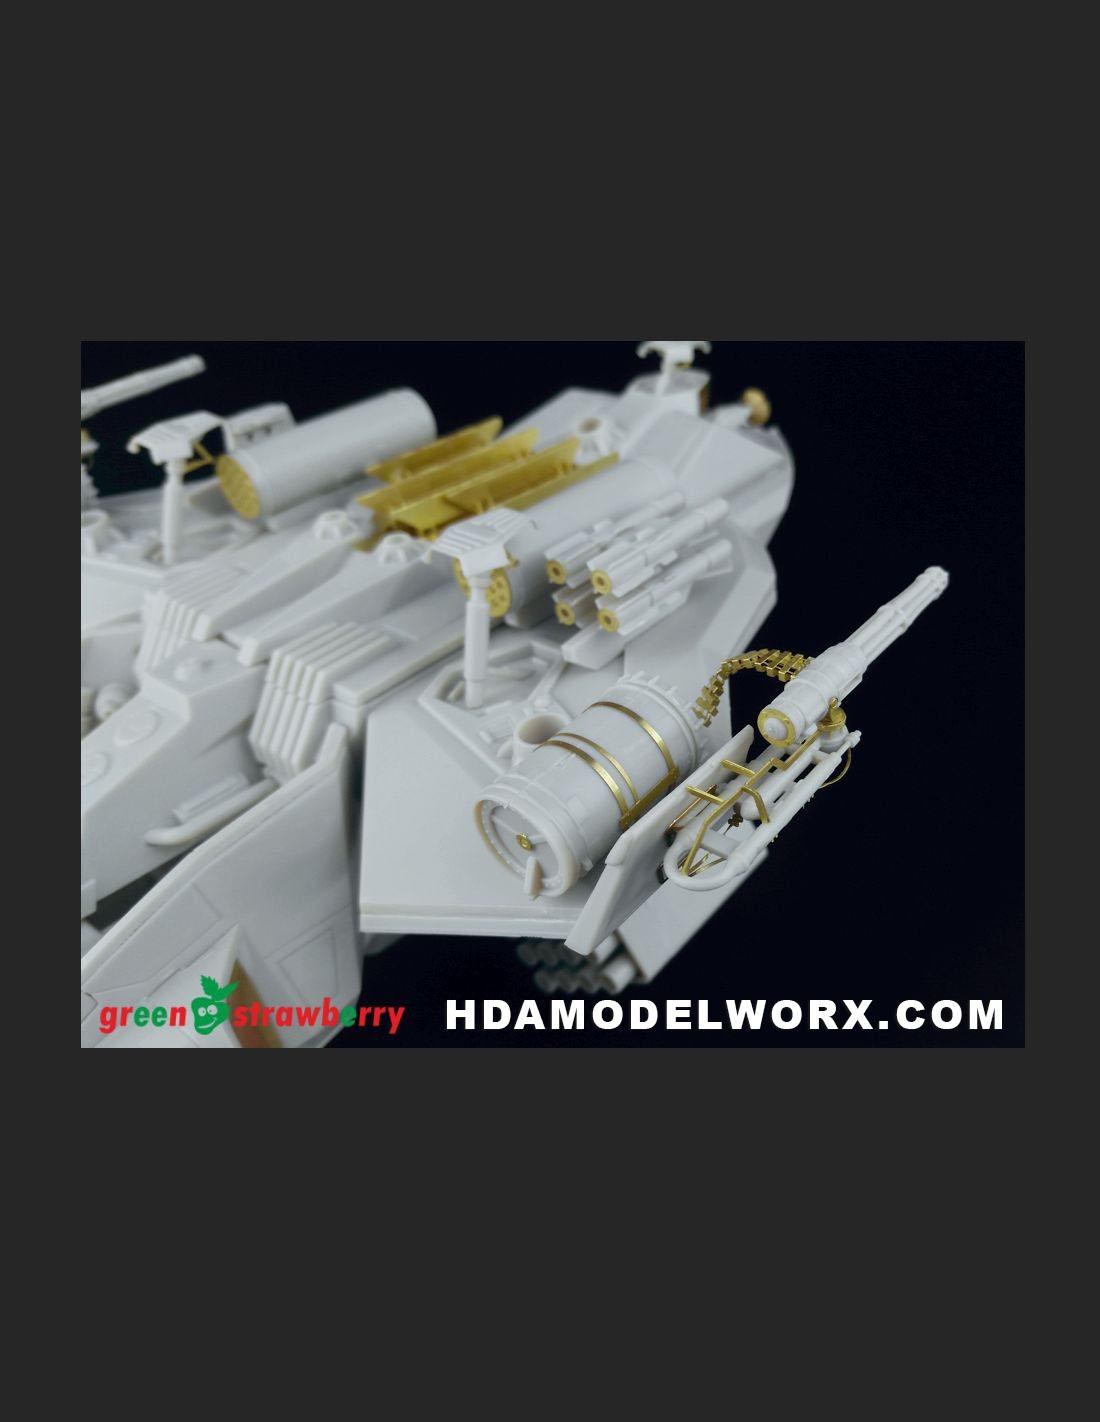 Armament Set Waffe 1:32 Model Kit Moebius Battlestar Galactica Colonial Raptor